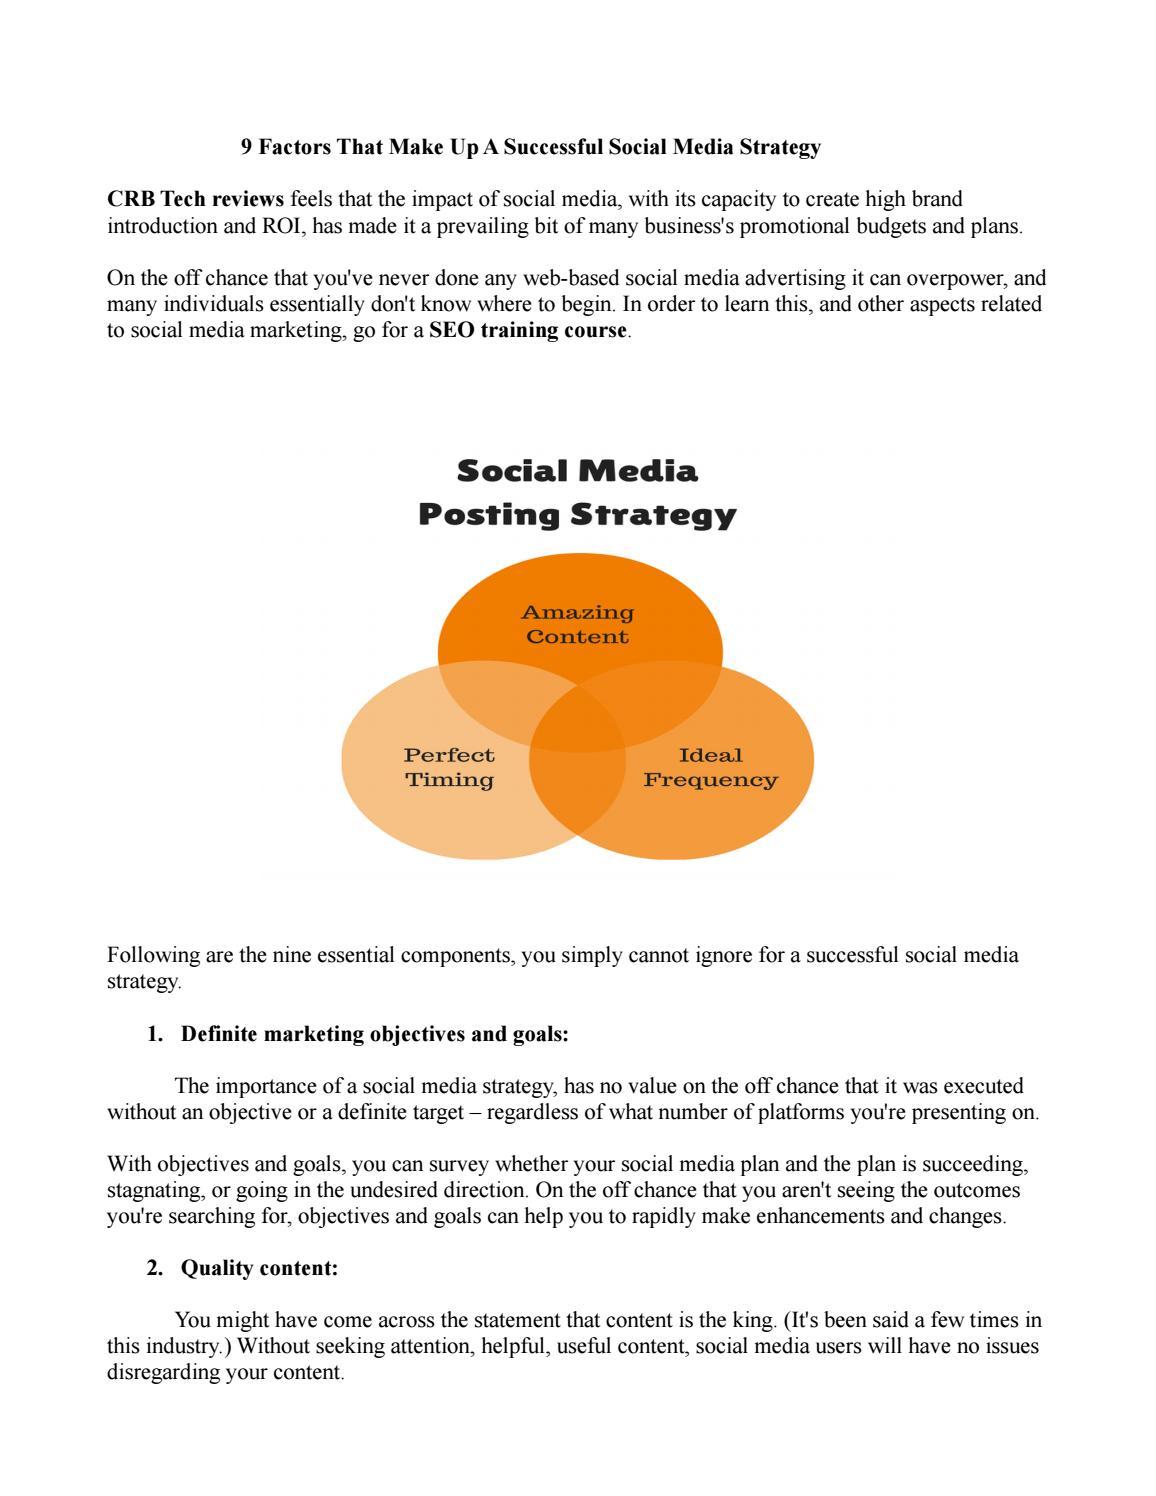 Environmental Factors in Strategic Planning